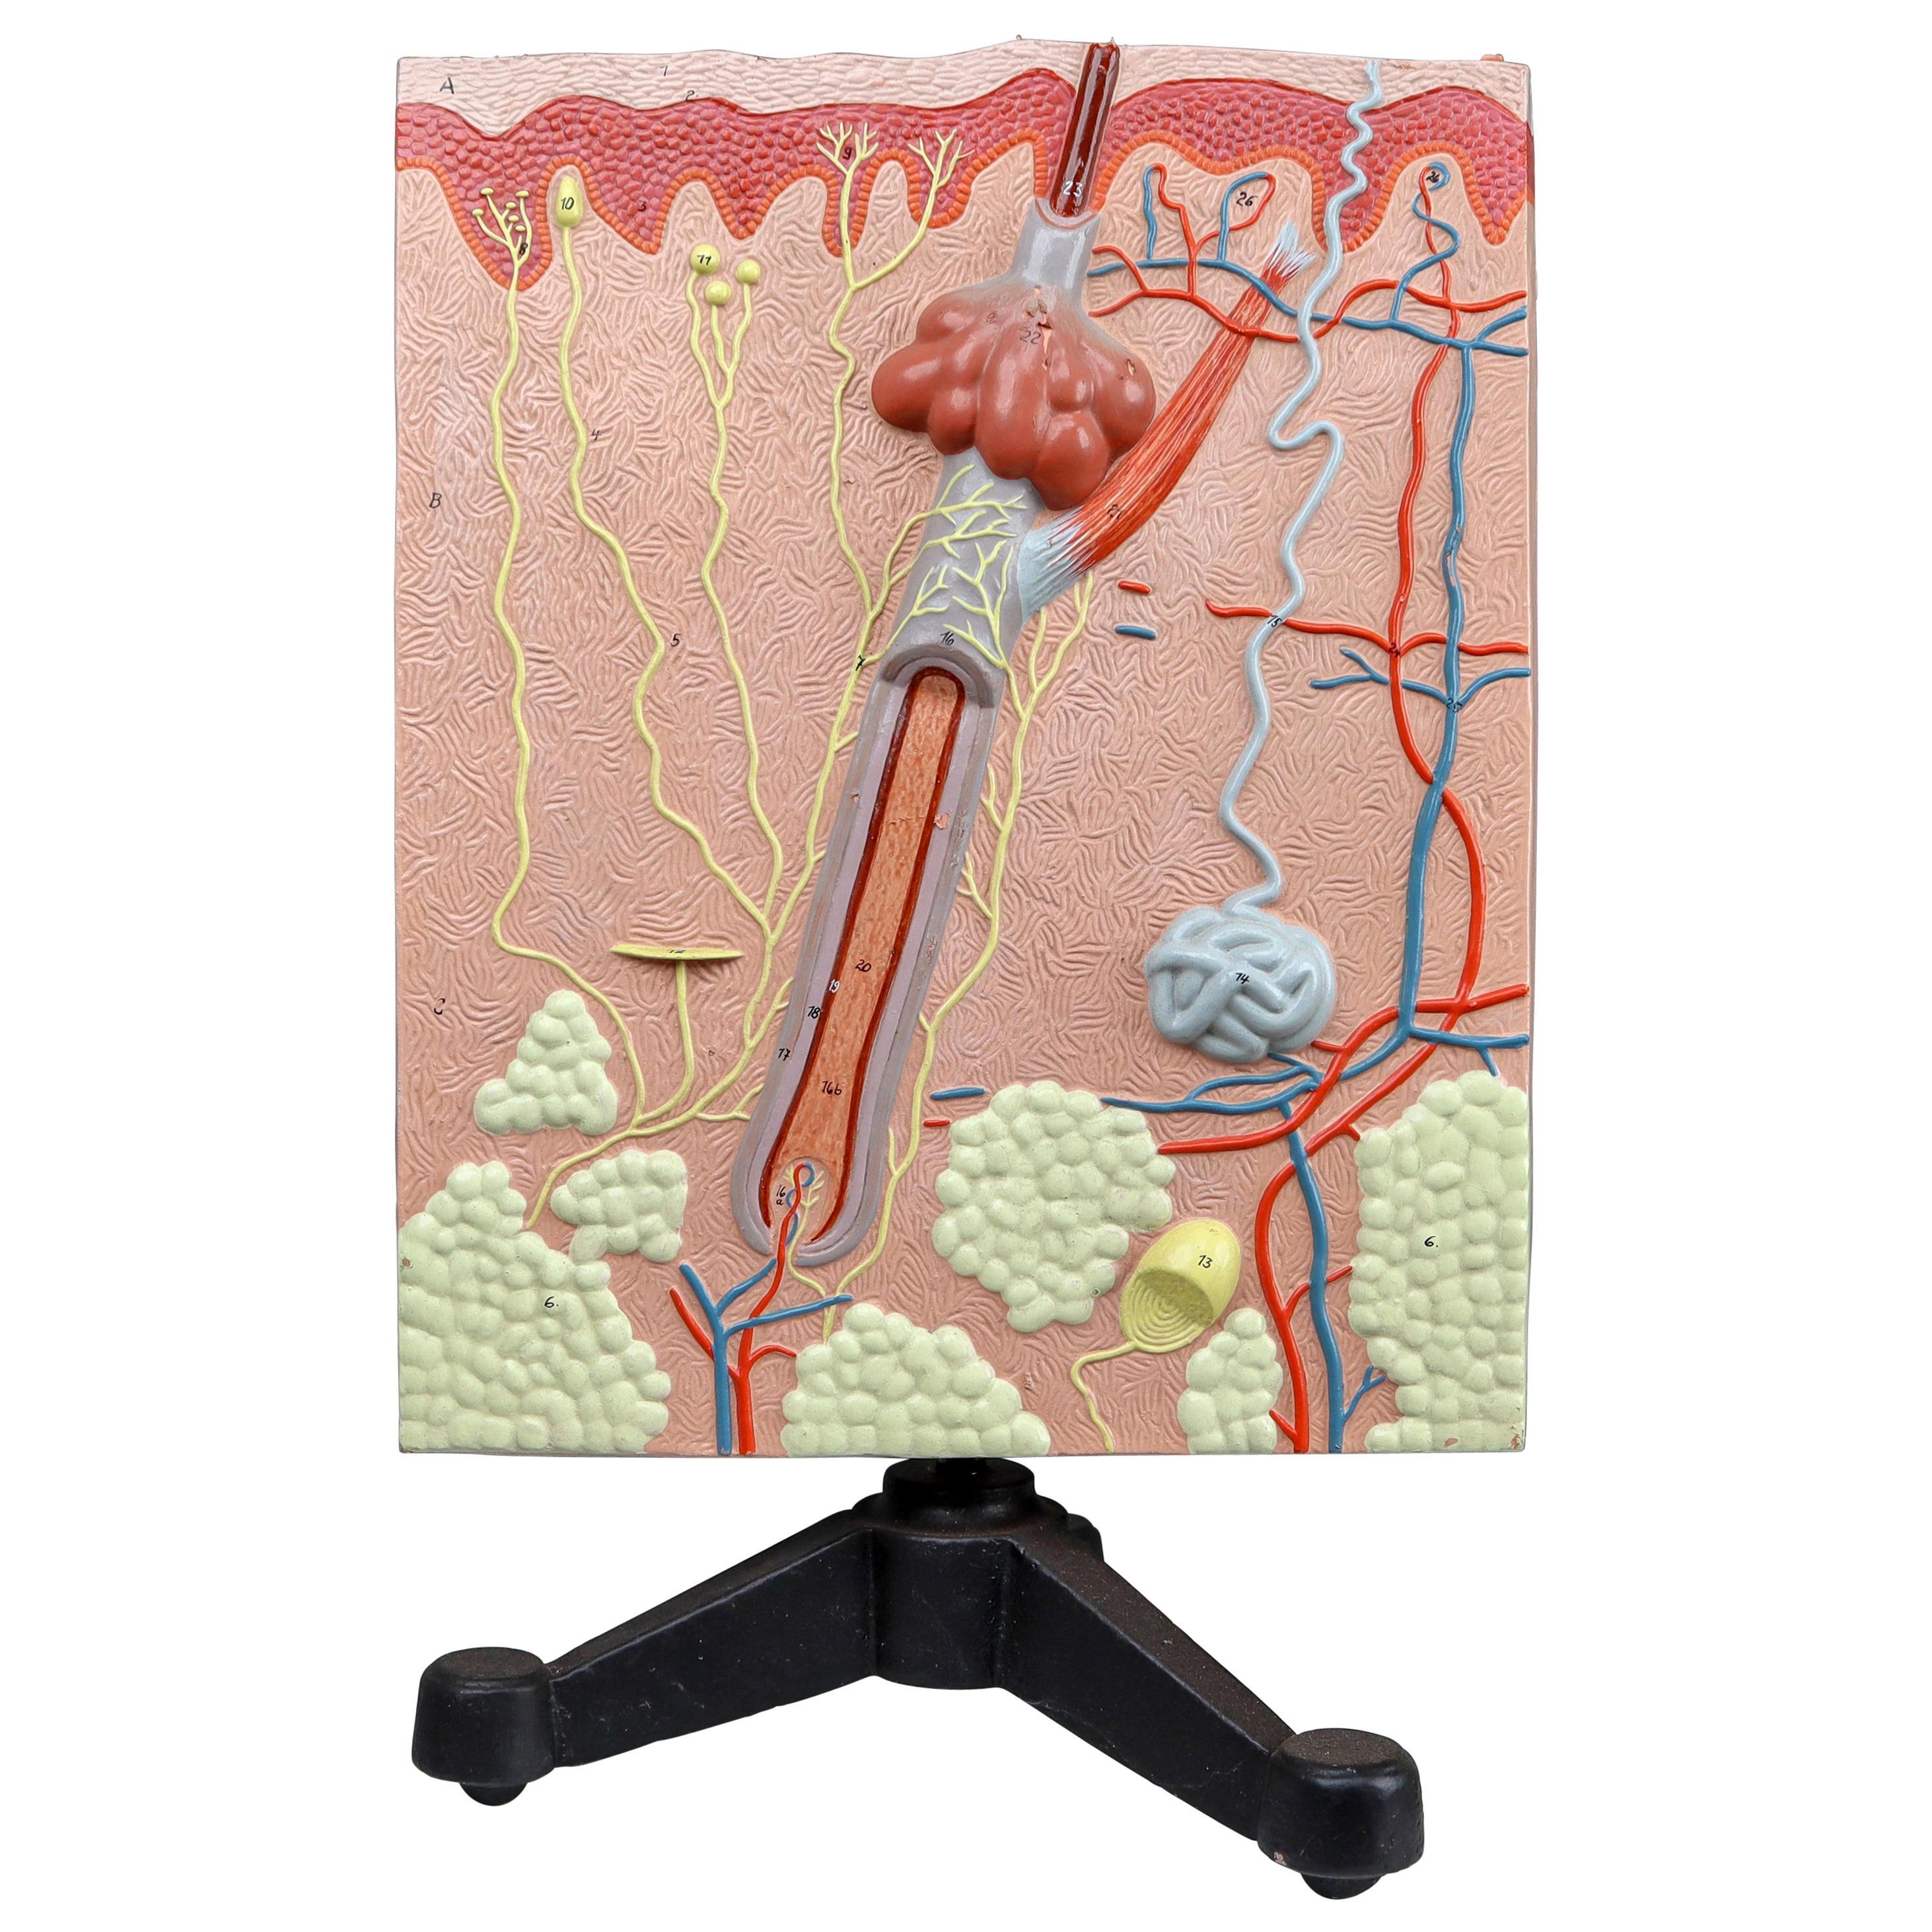 Anatomical Teaching Model Plaster on Metal Base Czech Republic, 1960s